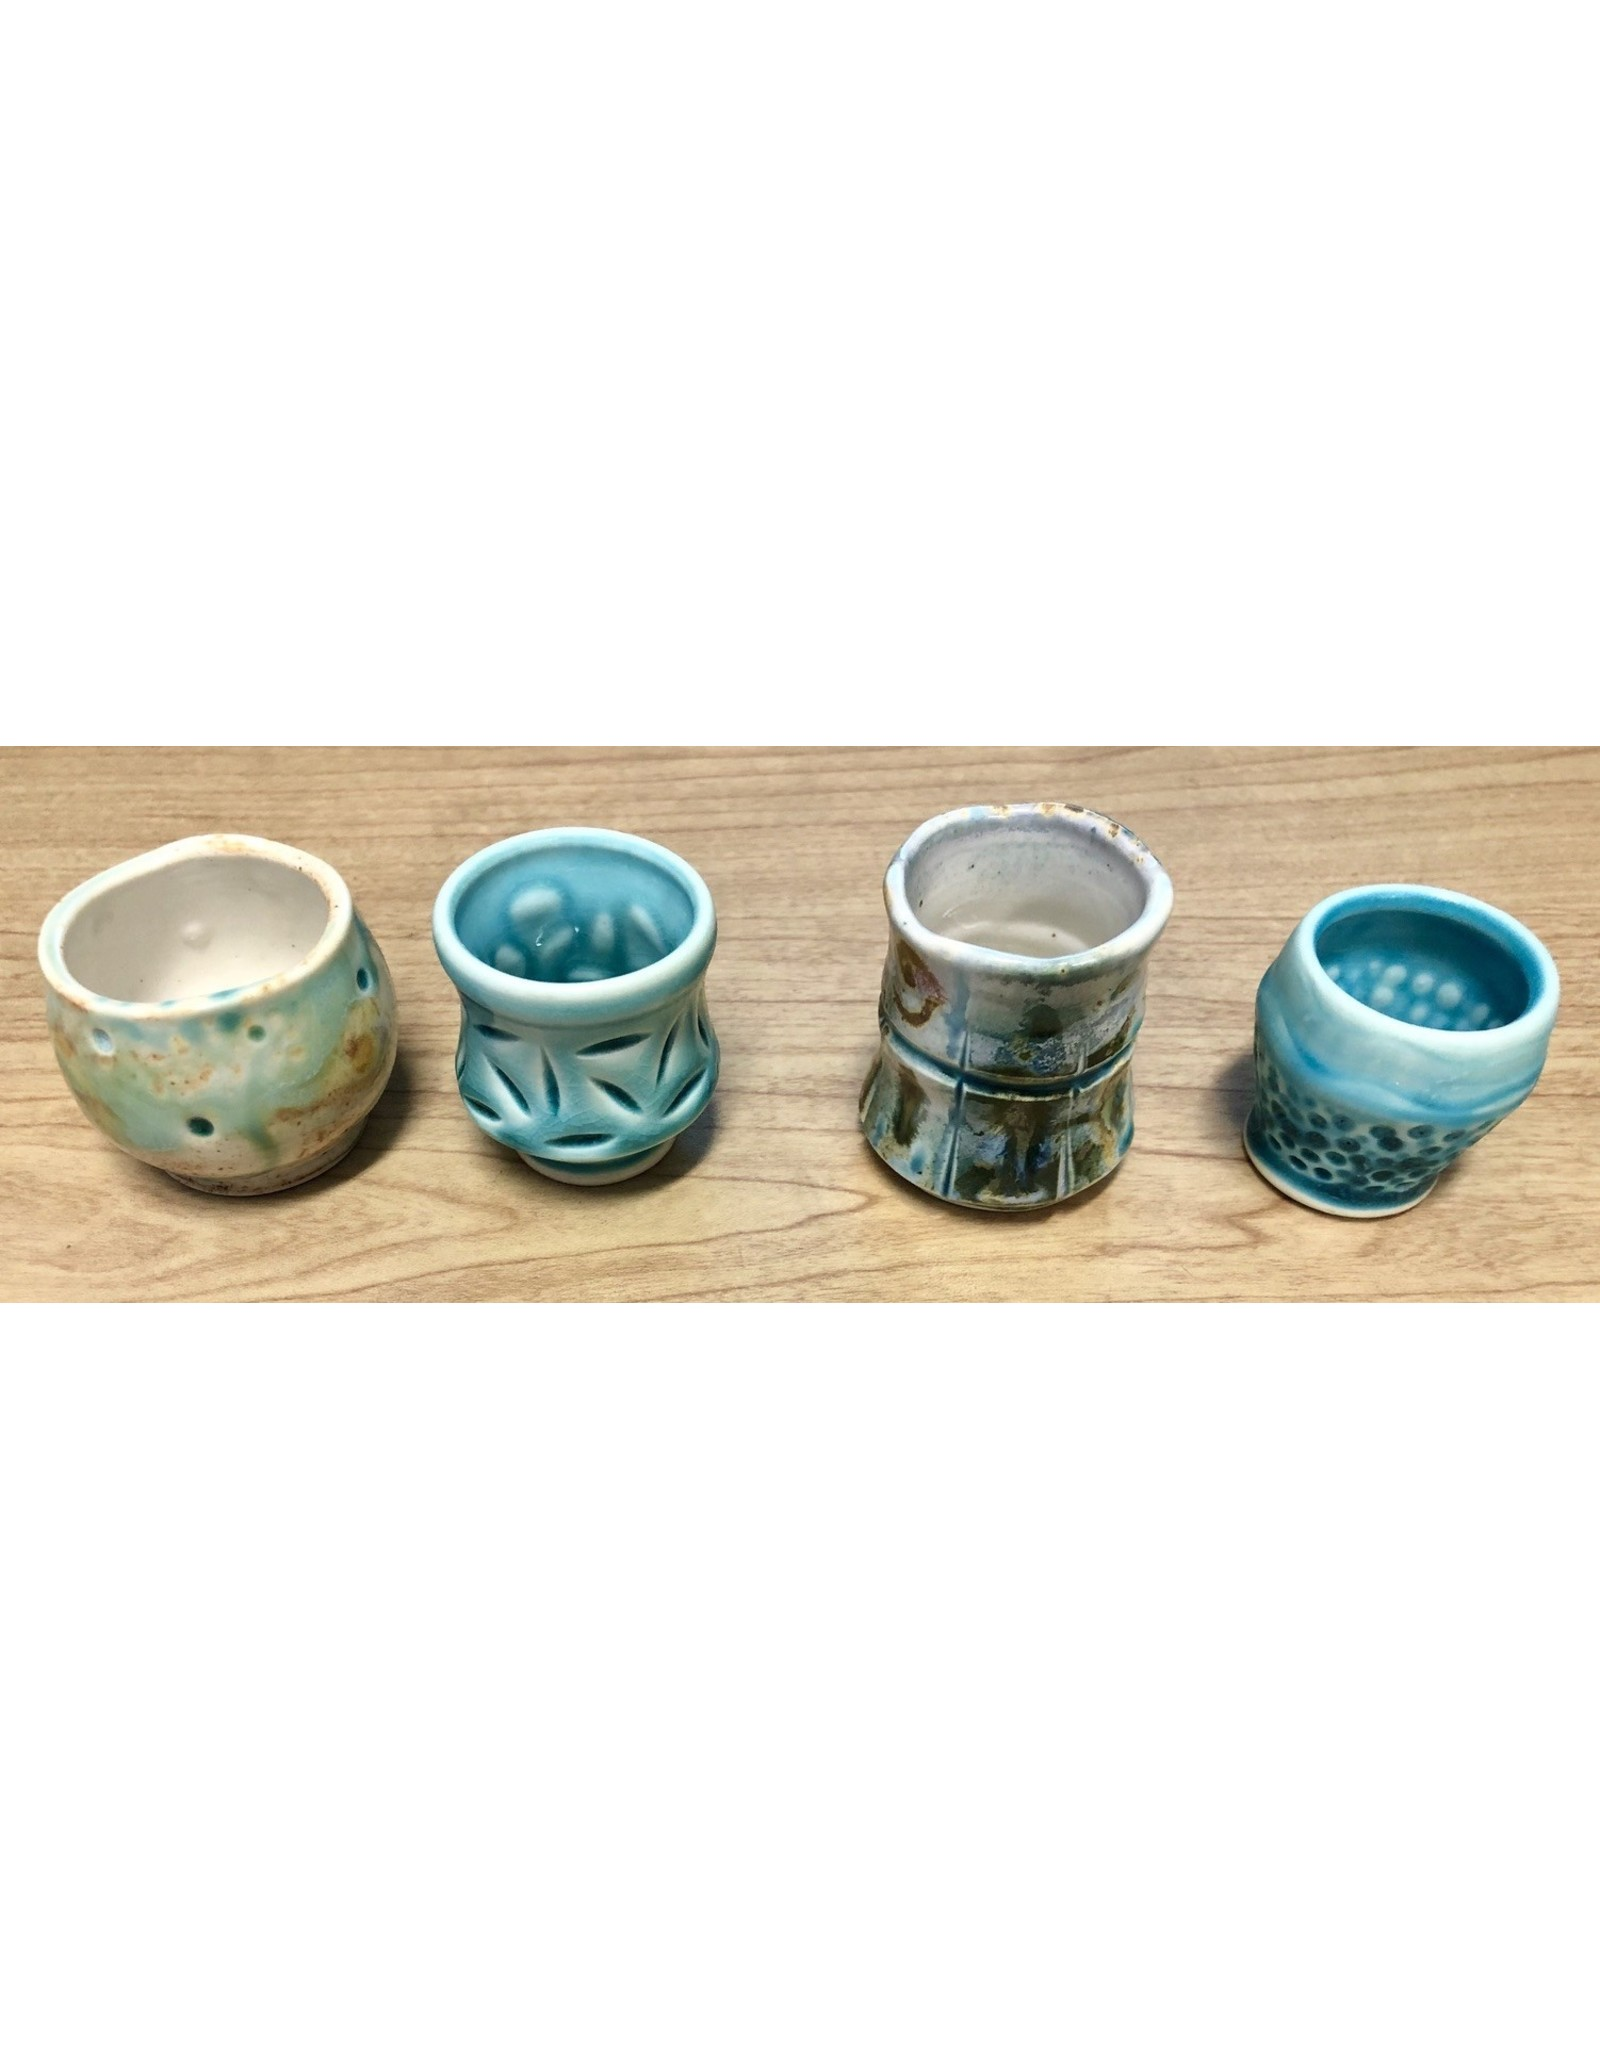 Gail Snively SHOT GLASS (Ceramic, #20001)